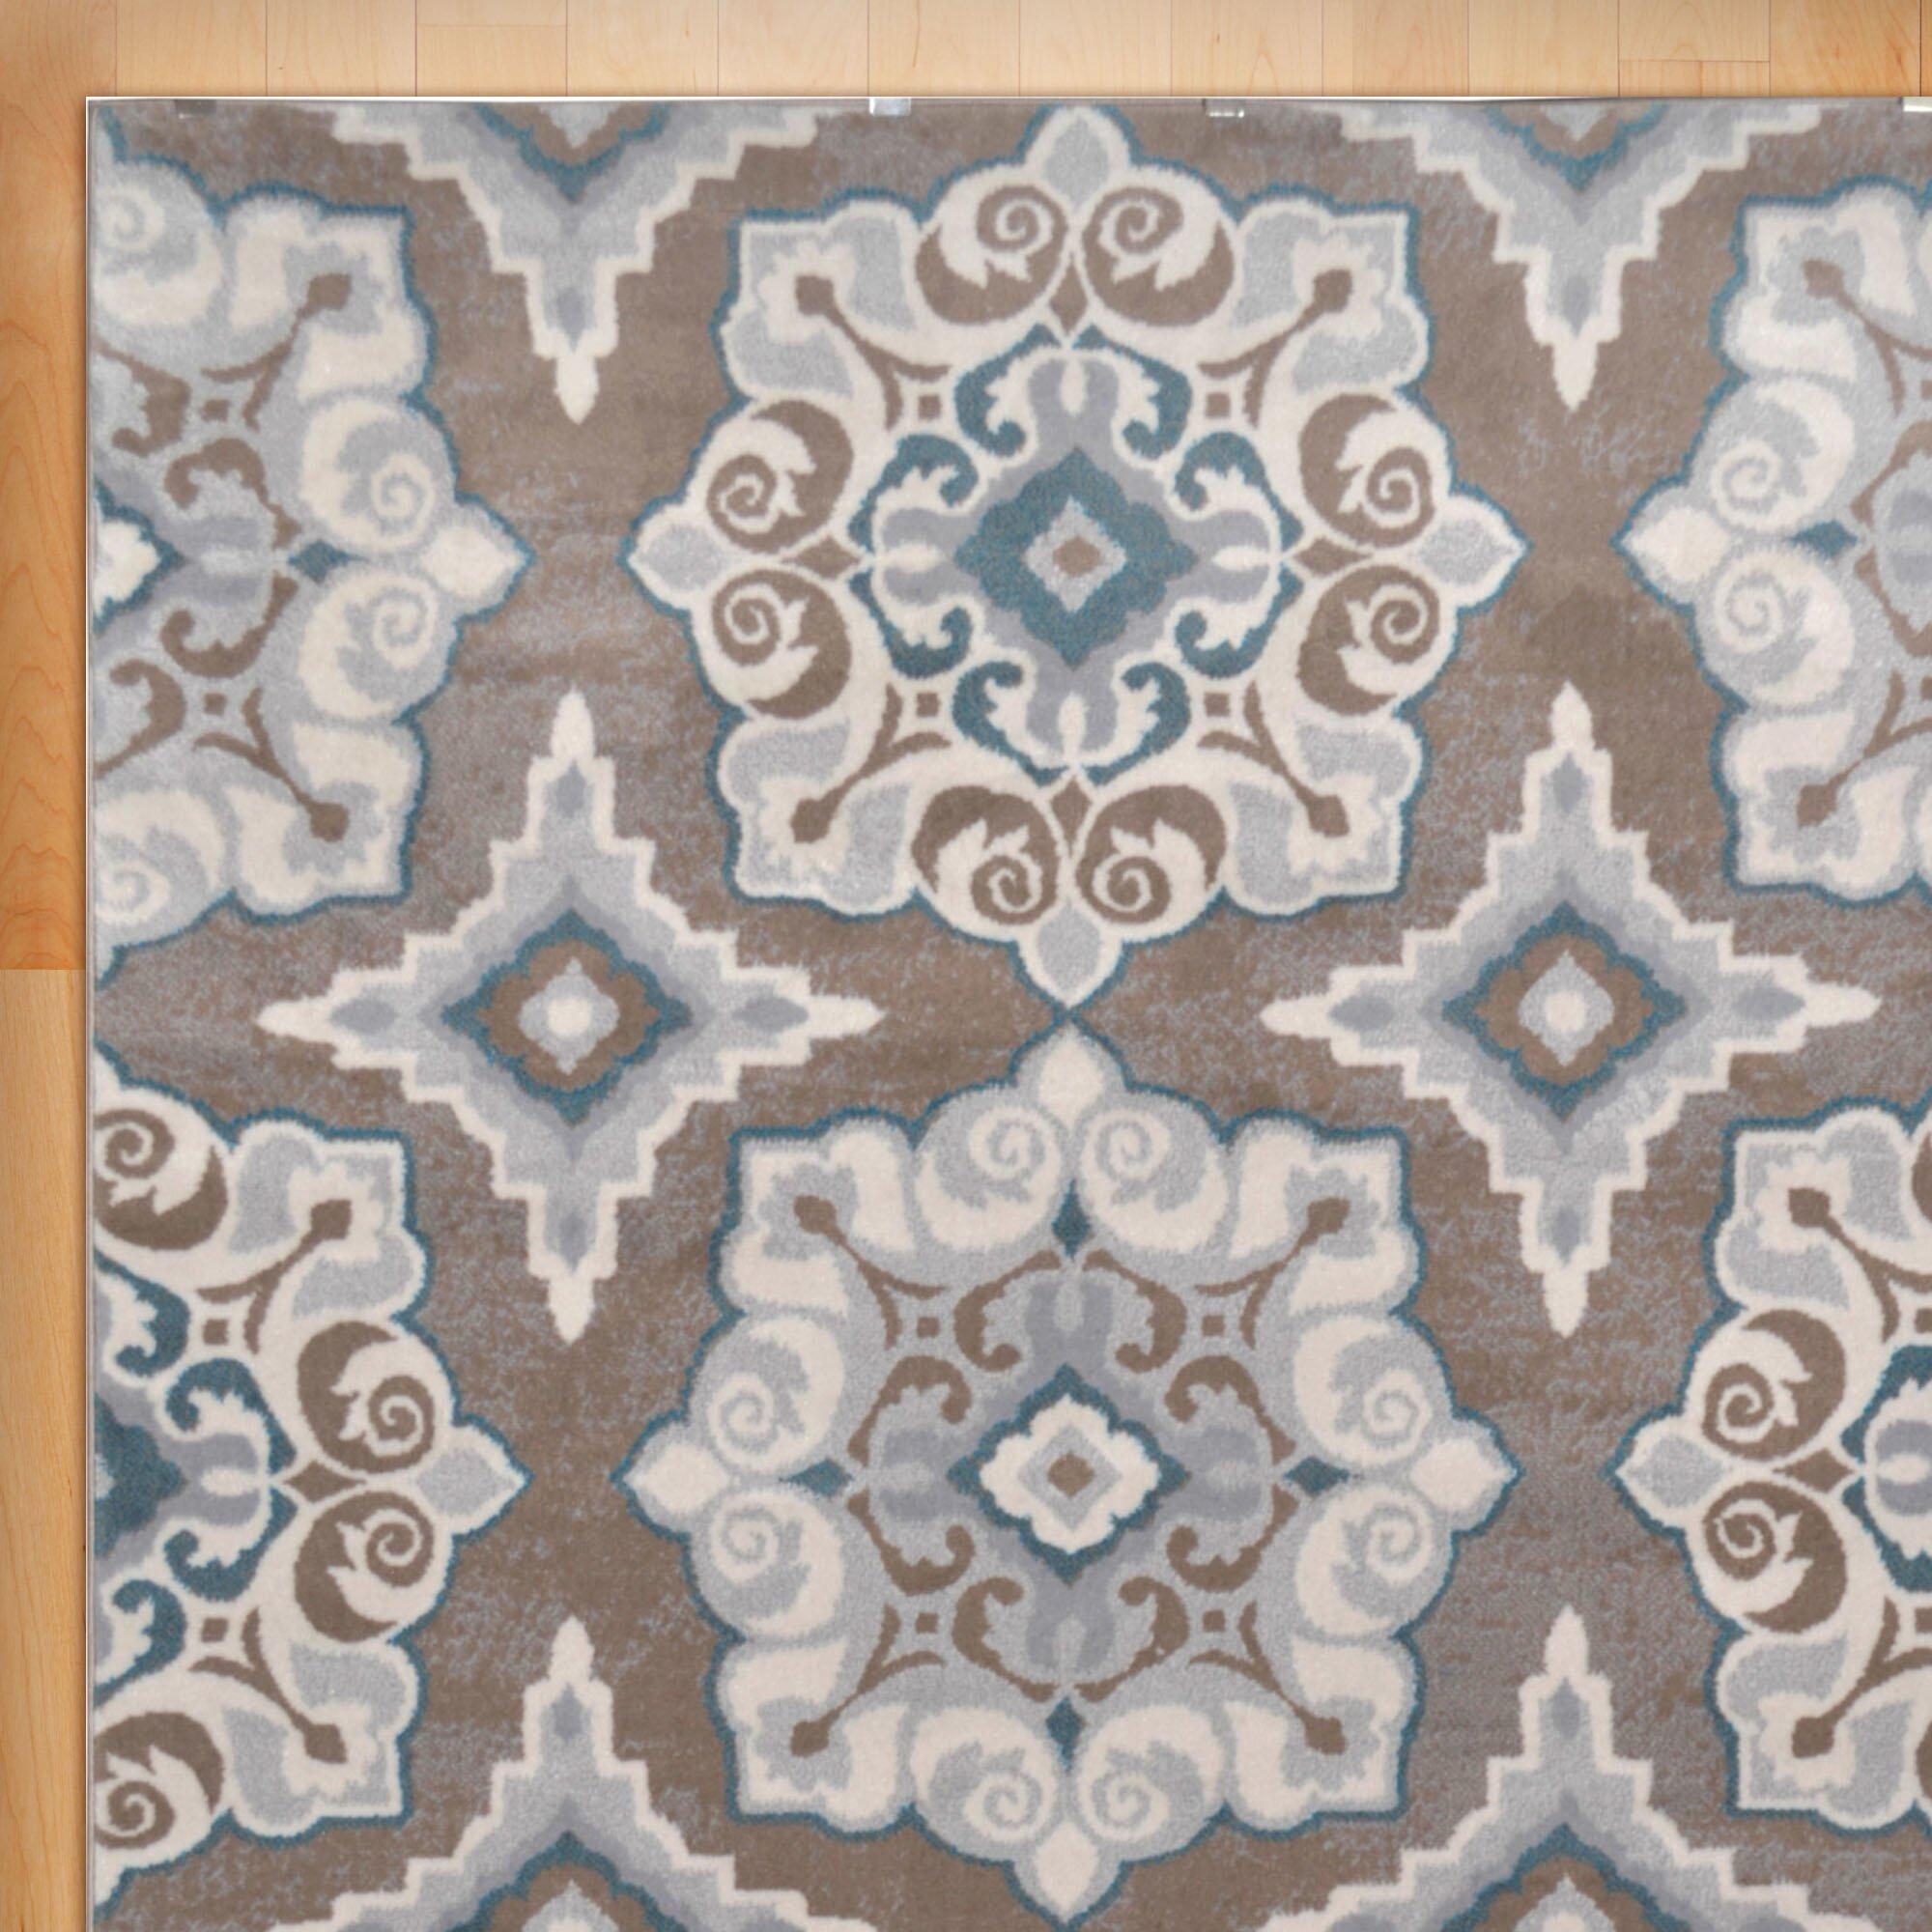 Andover Mills Natural Cerulean Blue/Tan Area Rug & Reviews